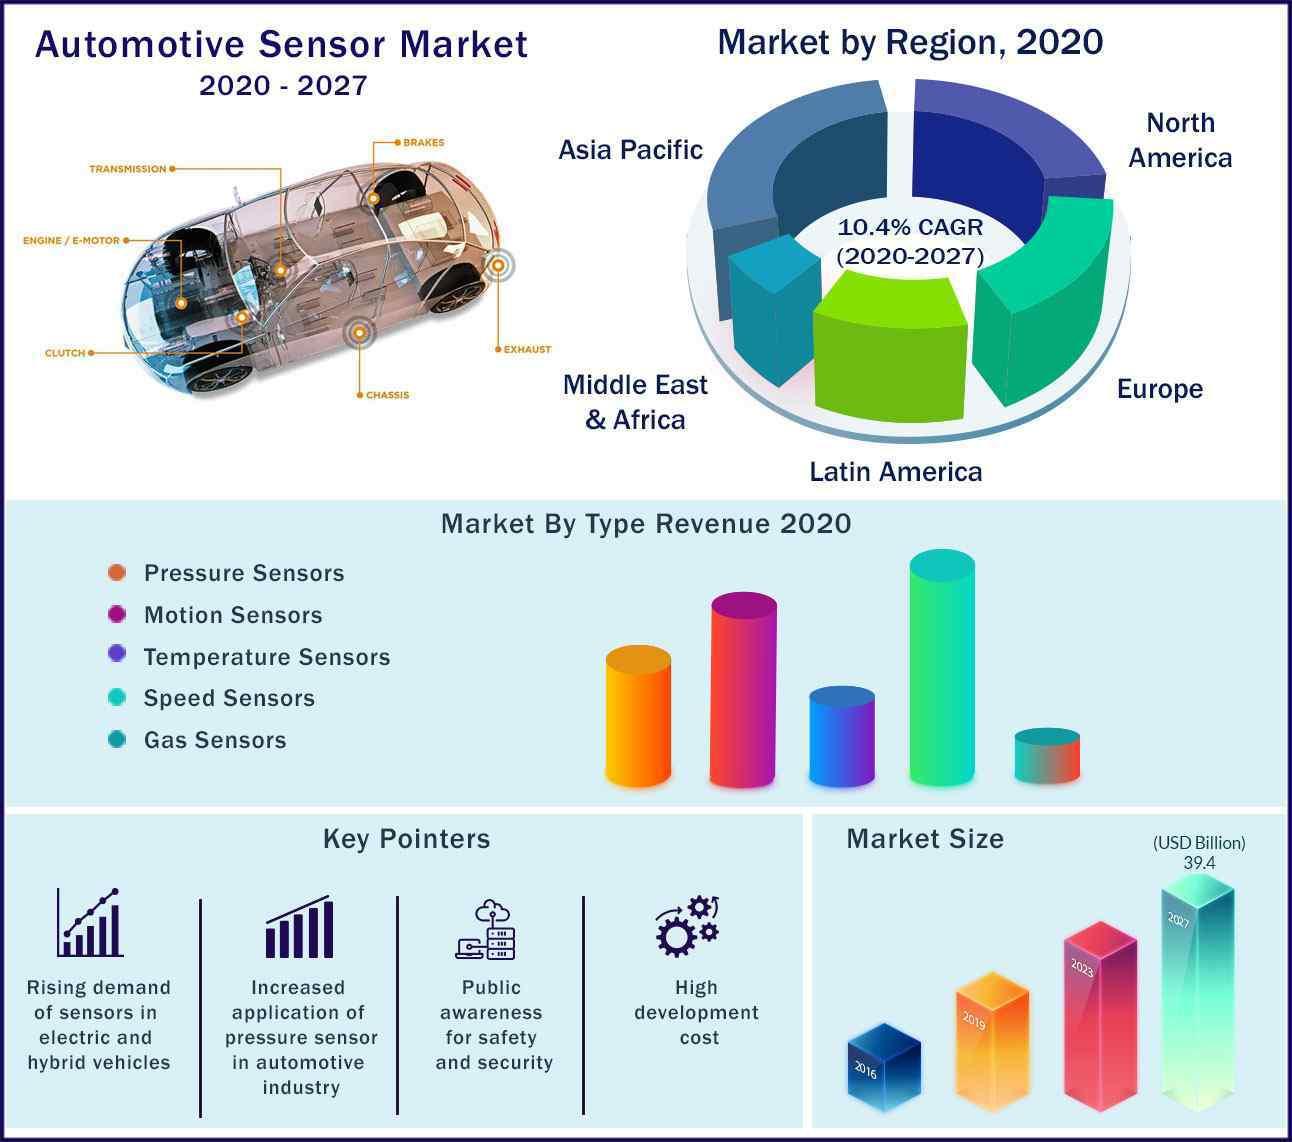 Global Automotive Sensor Market 2020-2027